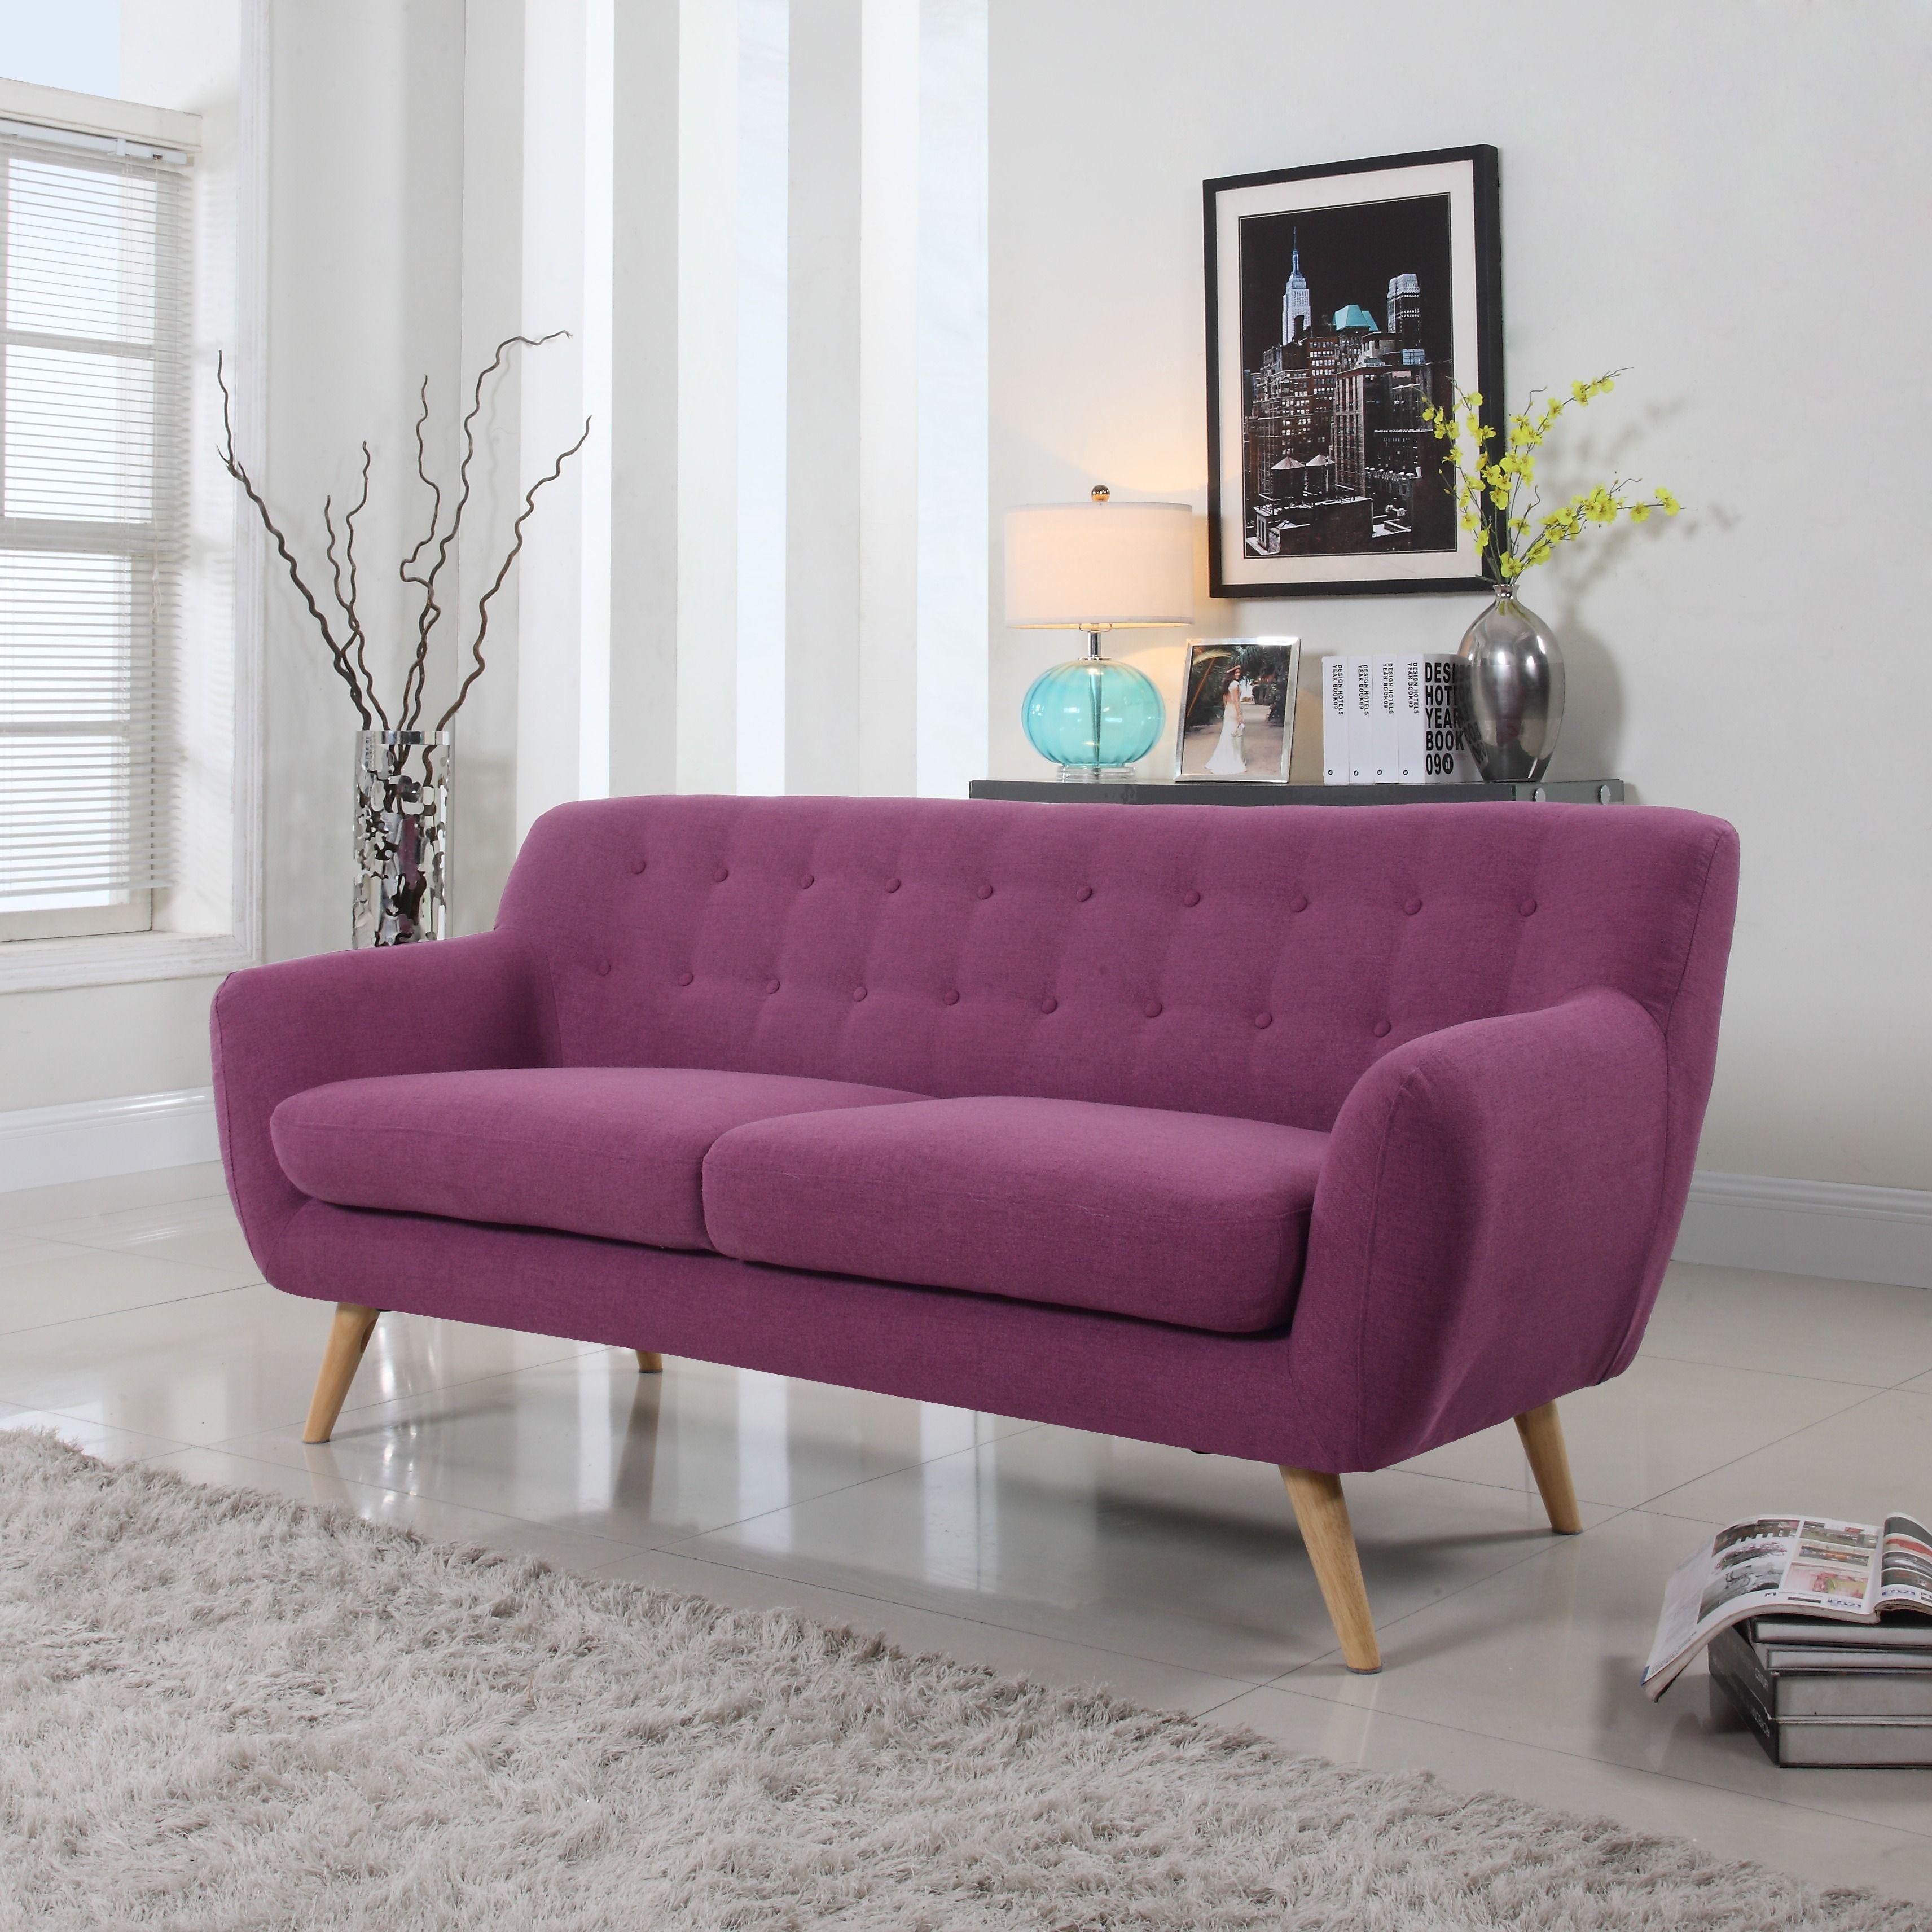 Madison mid century modern tufted linen fabric sofa purple